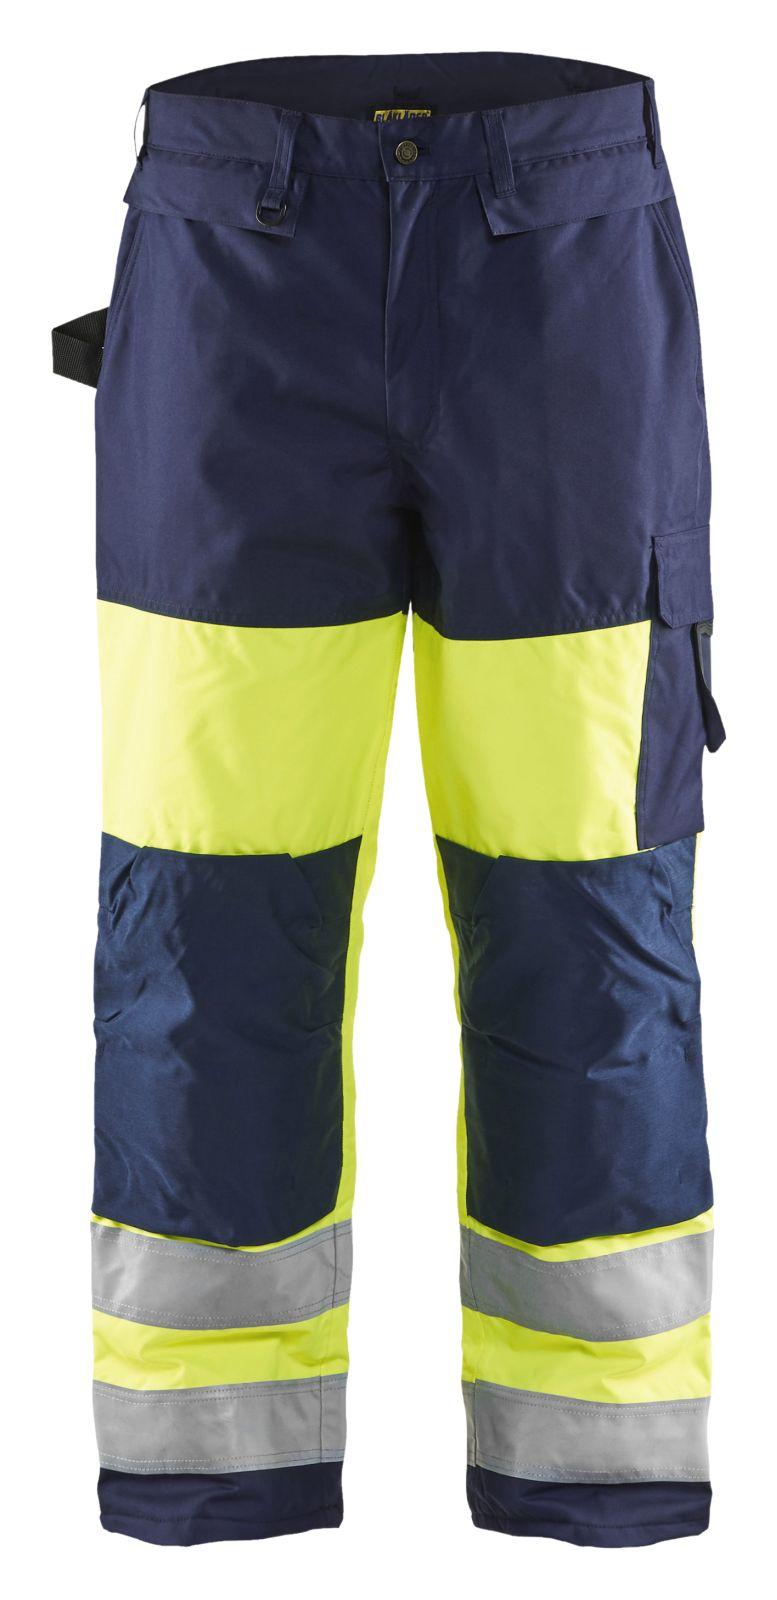 Blaklader Broeken 18831997 High Vis geel-marineblauw(3389)